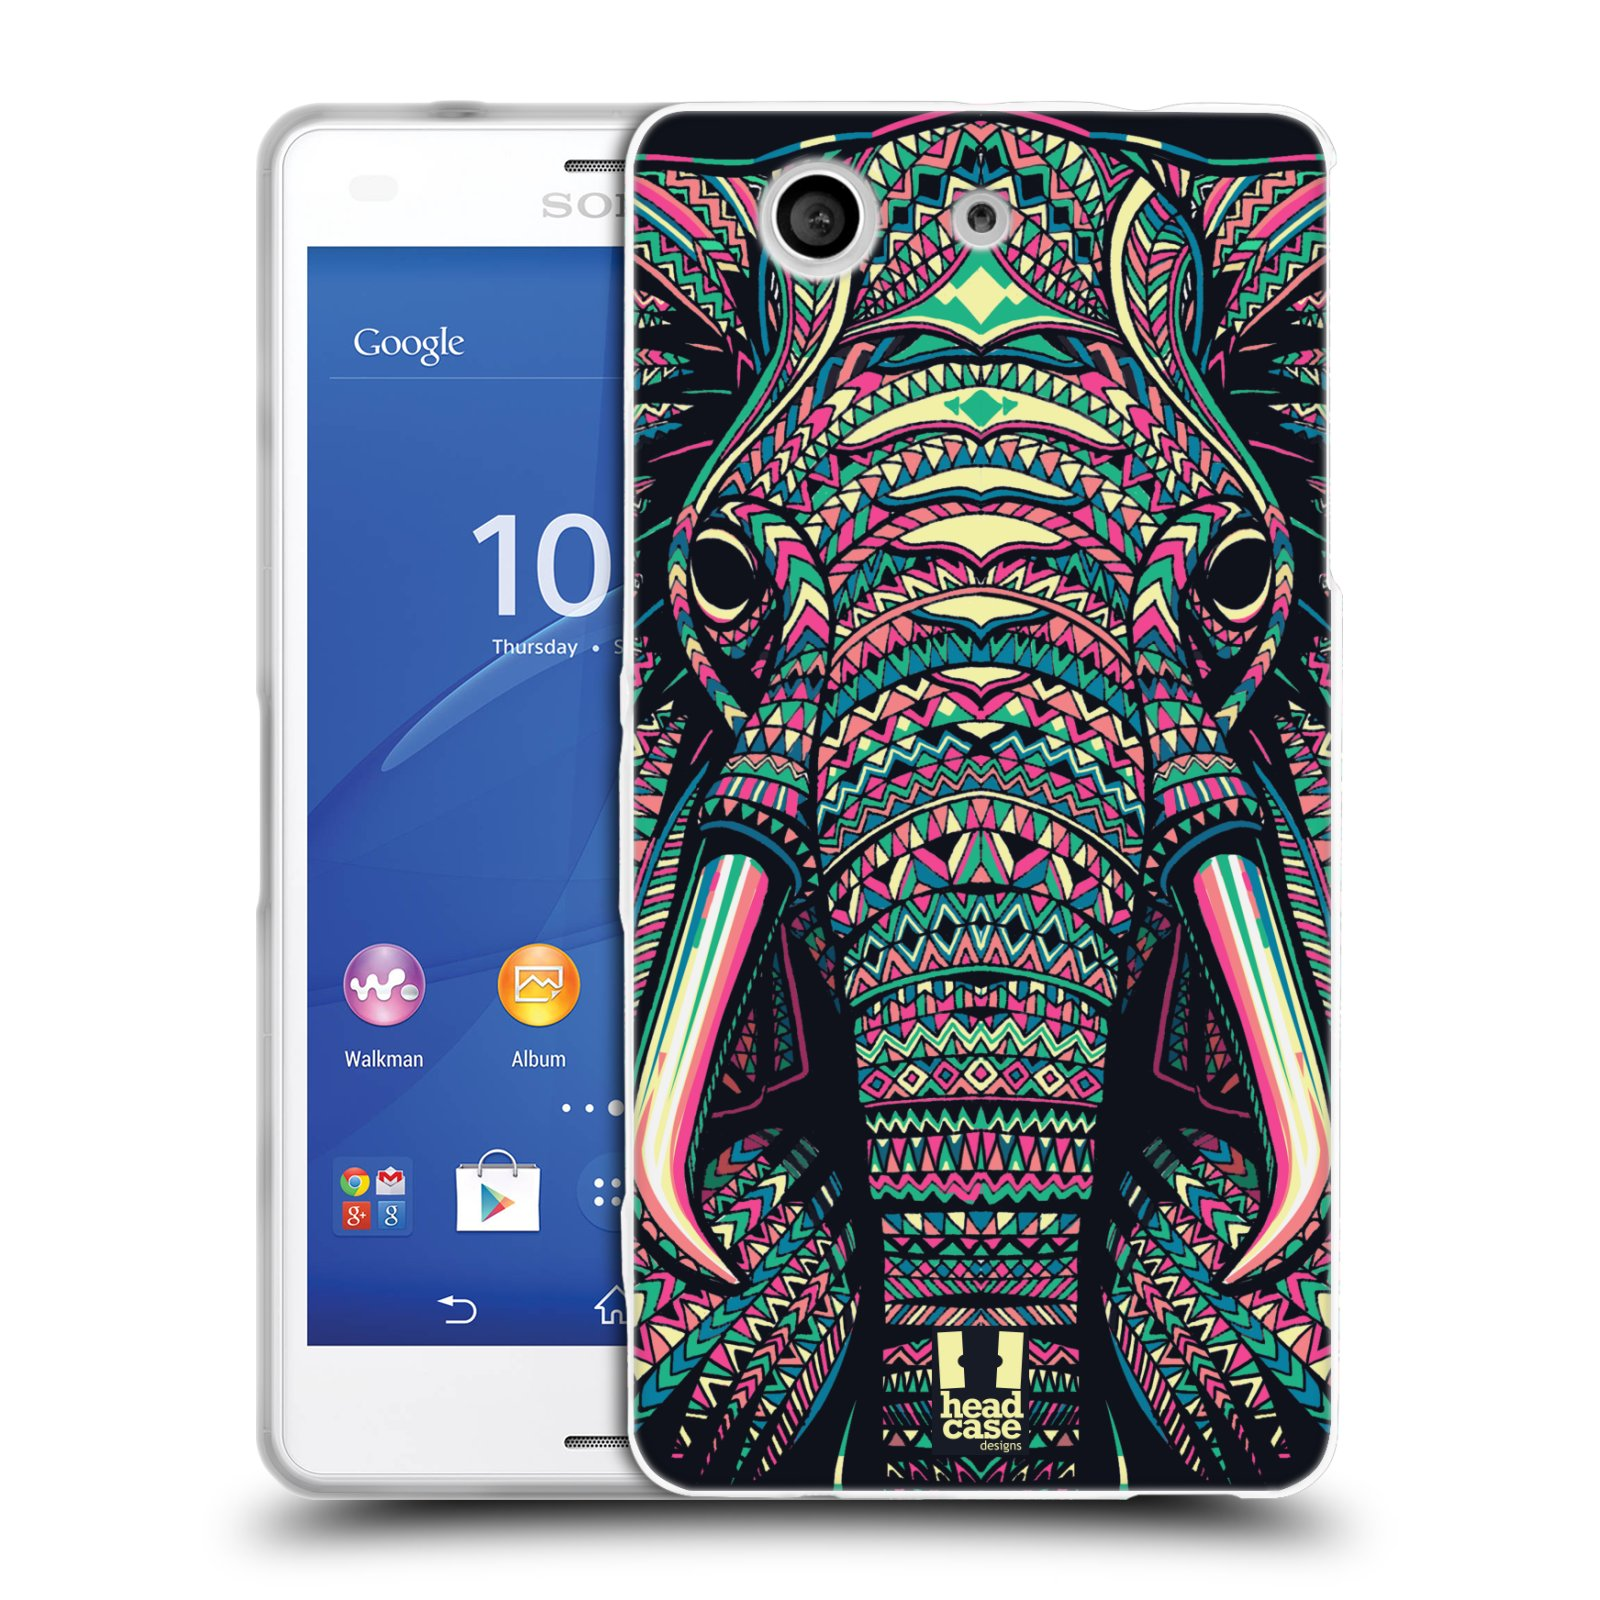 Silikonové pouzdro na mobil Sony Xperia Z3 Compact D5803 HEAD CASE AZTEC SLON